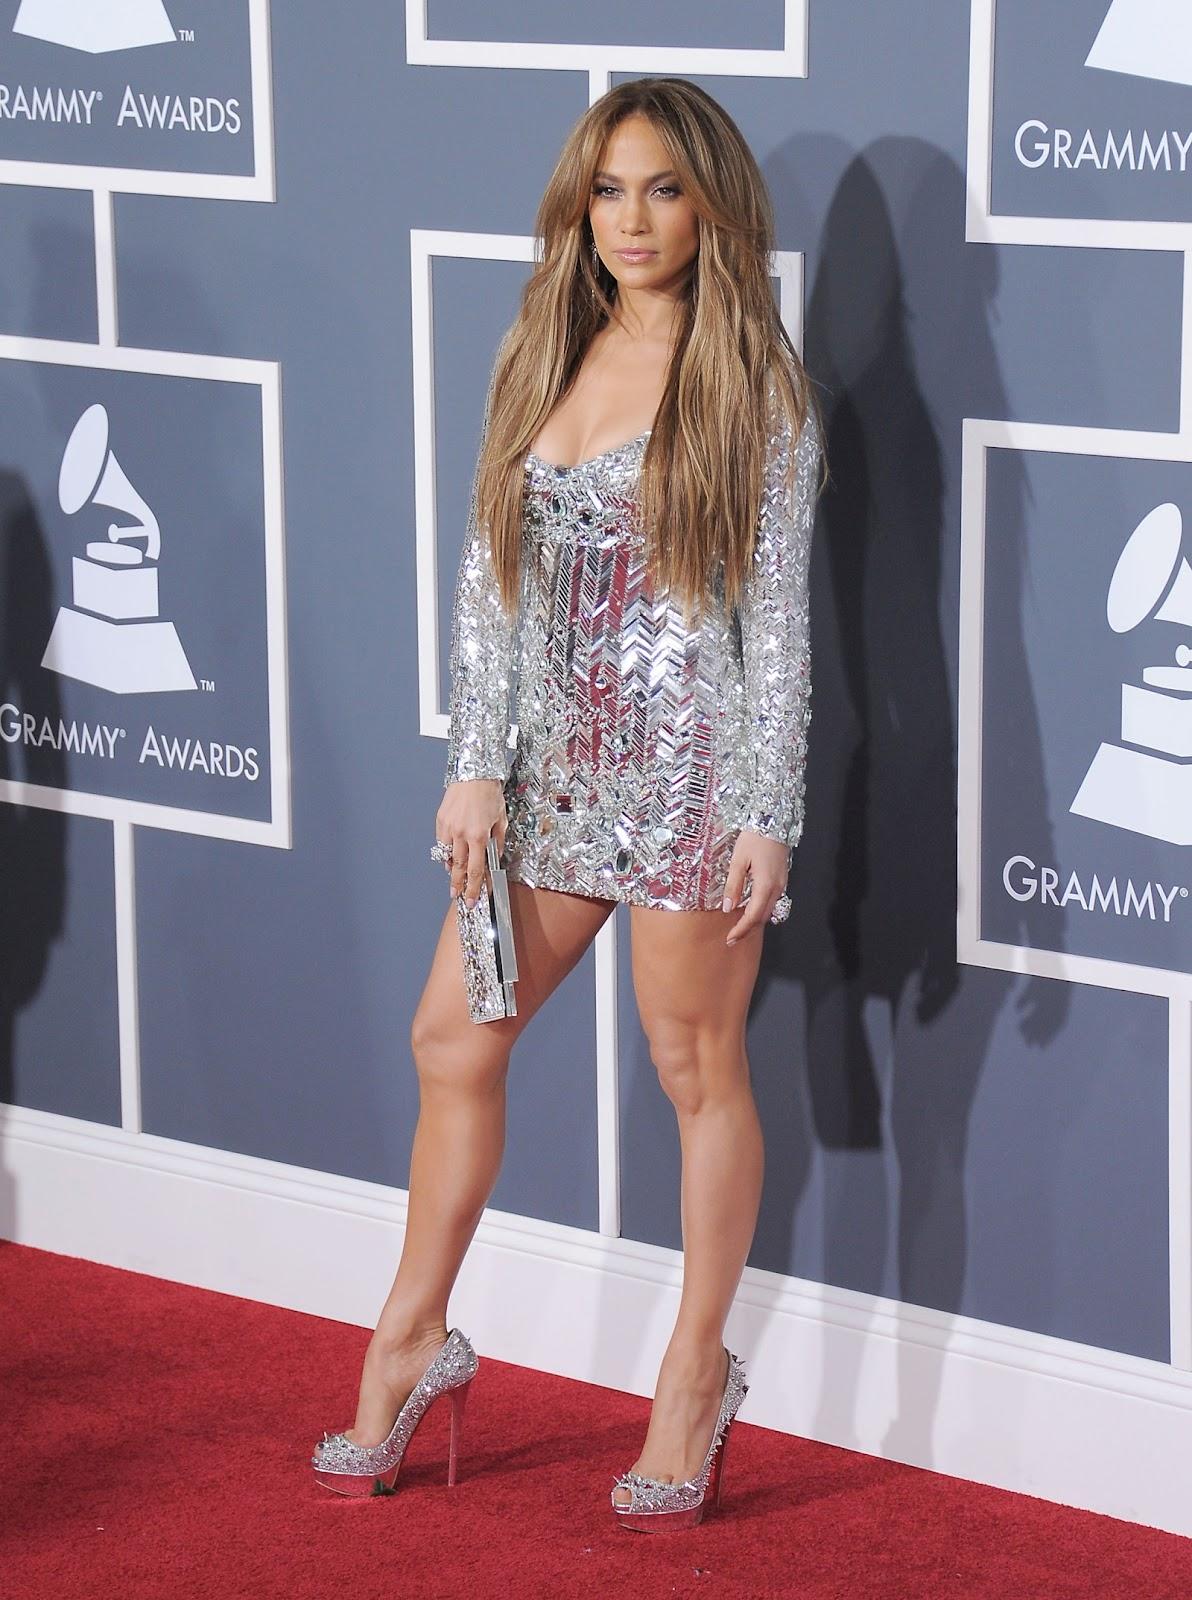 http://4.bp.blogspot.com/-CBygzagj9CA/UC8CunA9iqI/AAAAAAAADys/XhjvuTr6gsw/s1600/Jennifer+Lopez+Grammy+(2).jpg